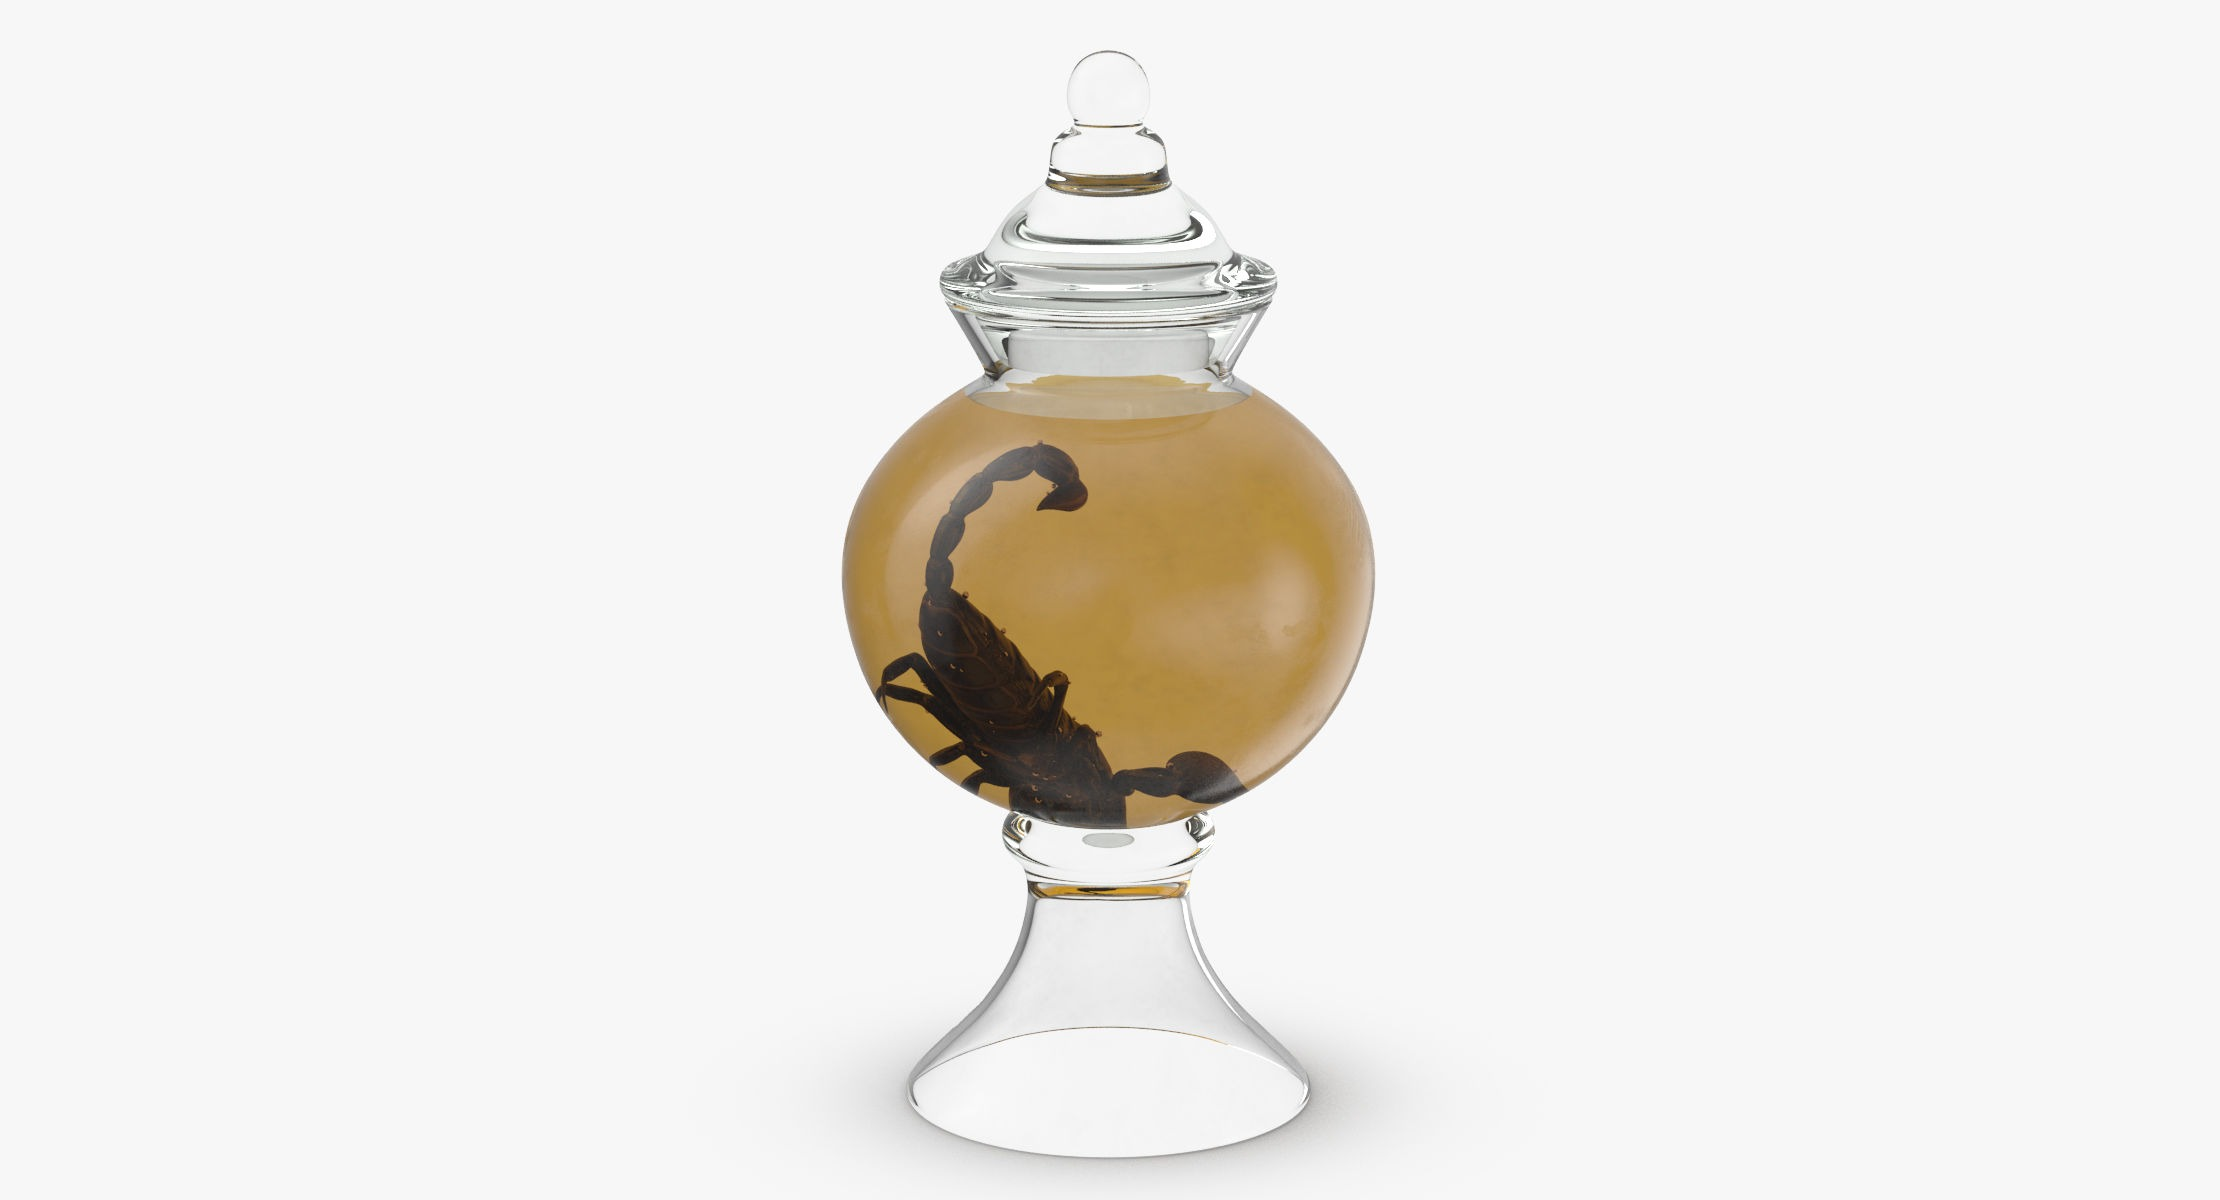 Vintage Specimen Jar - Scorpion - reel 1